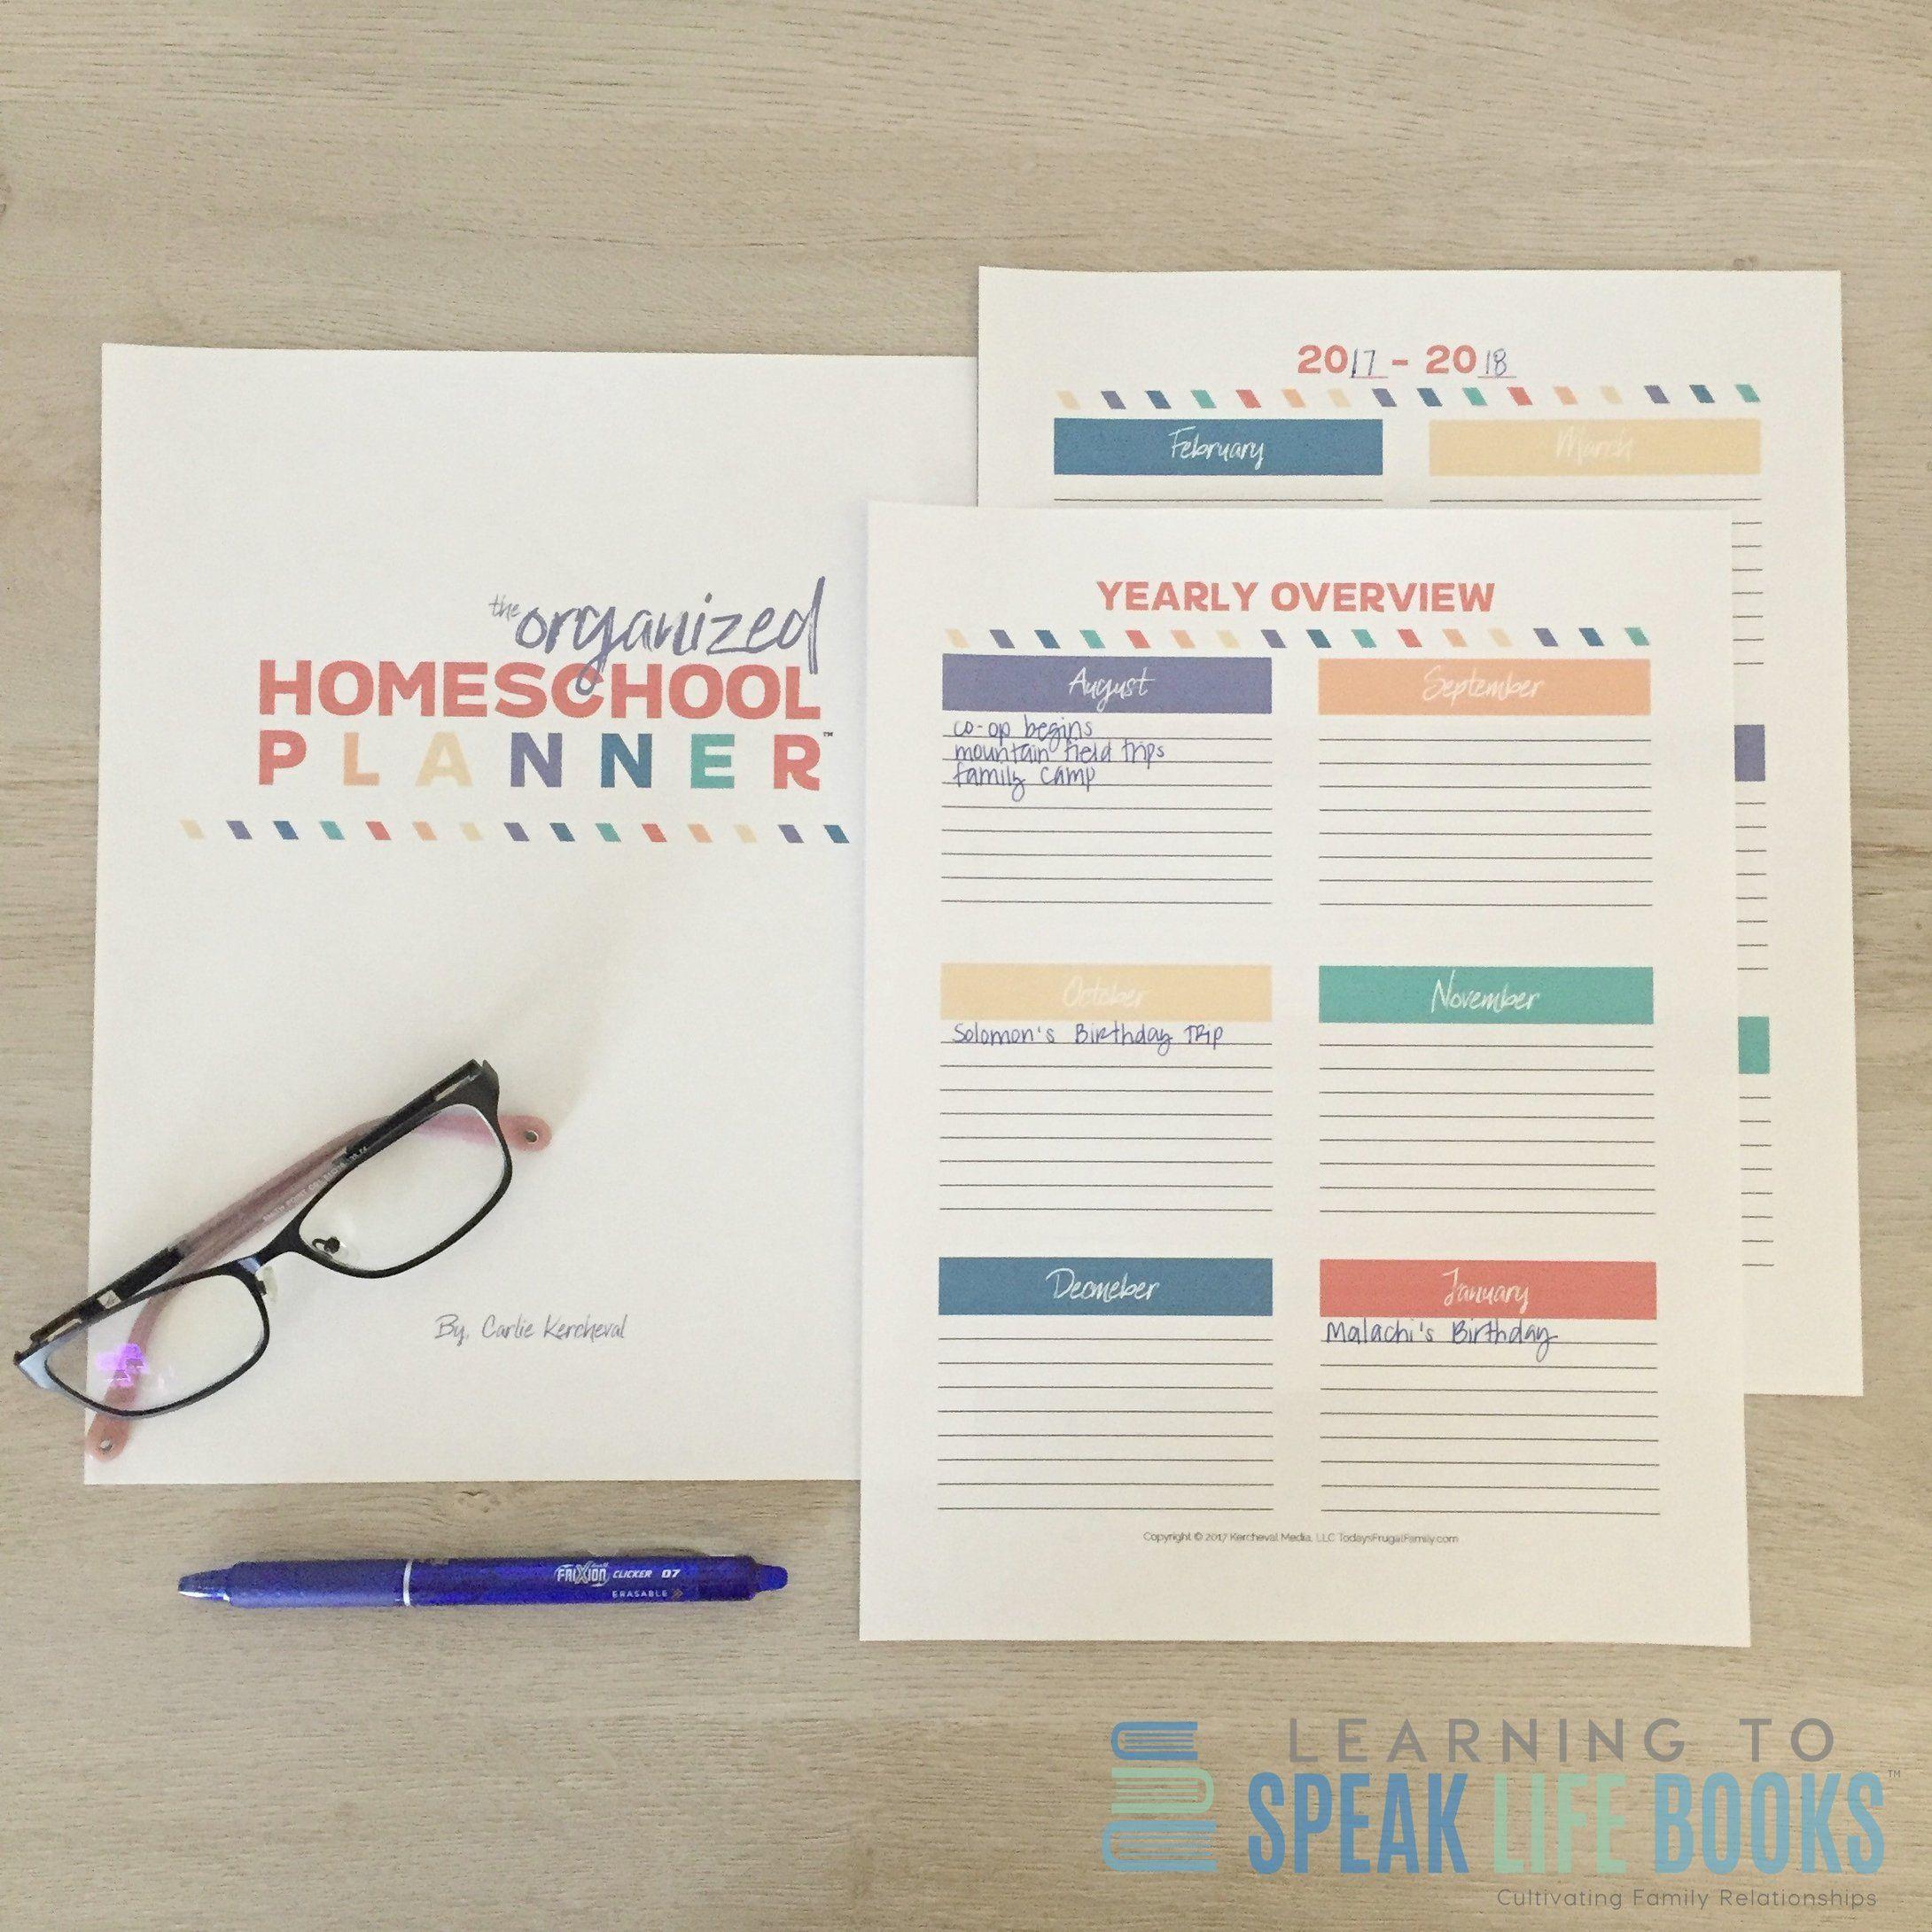 The Organized Homeschool Planner